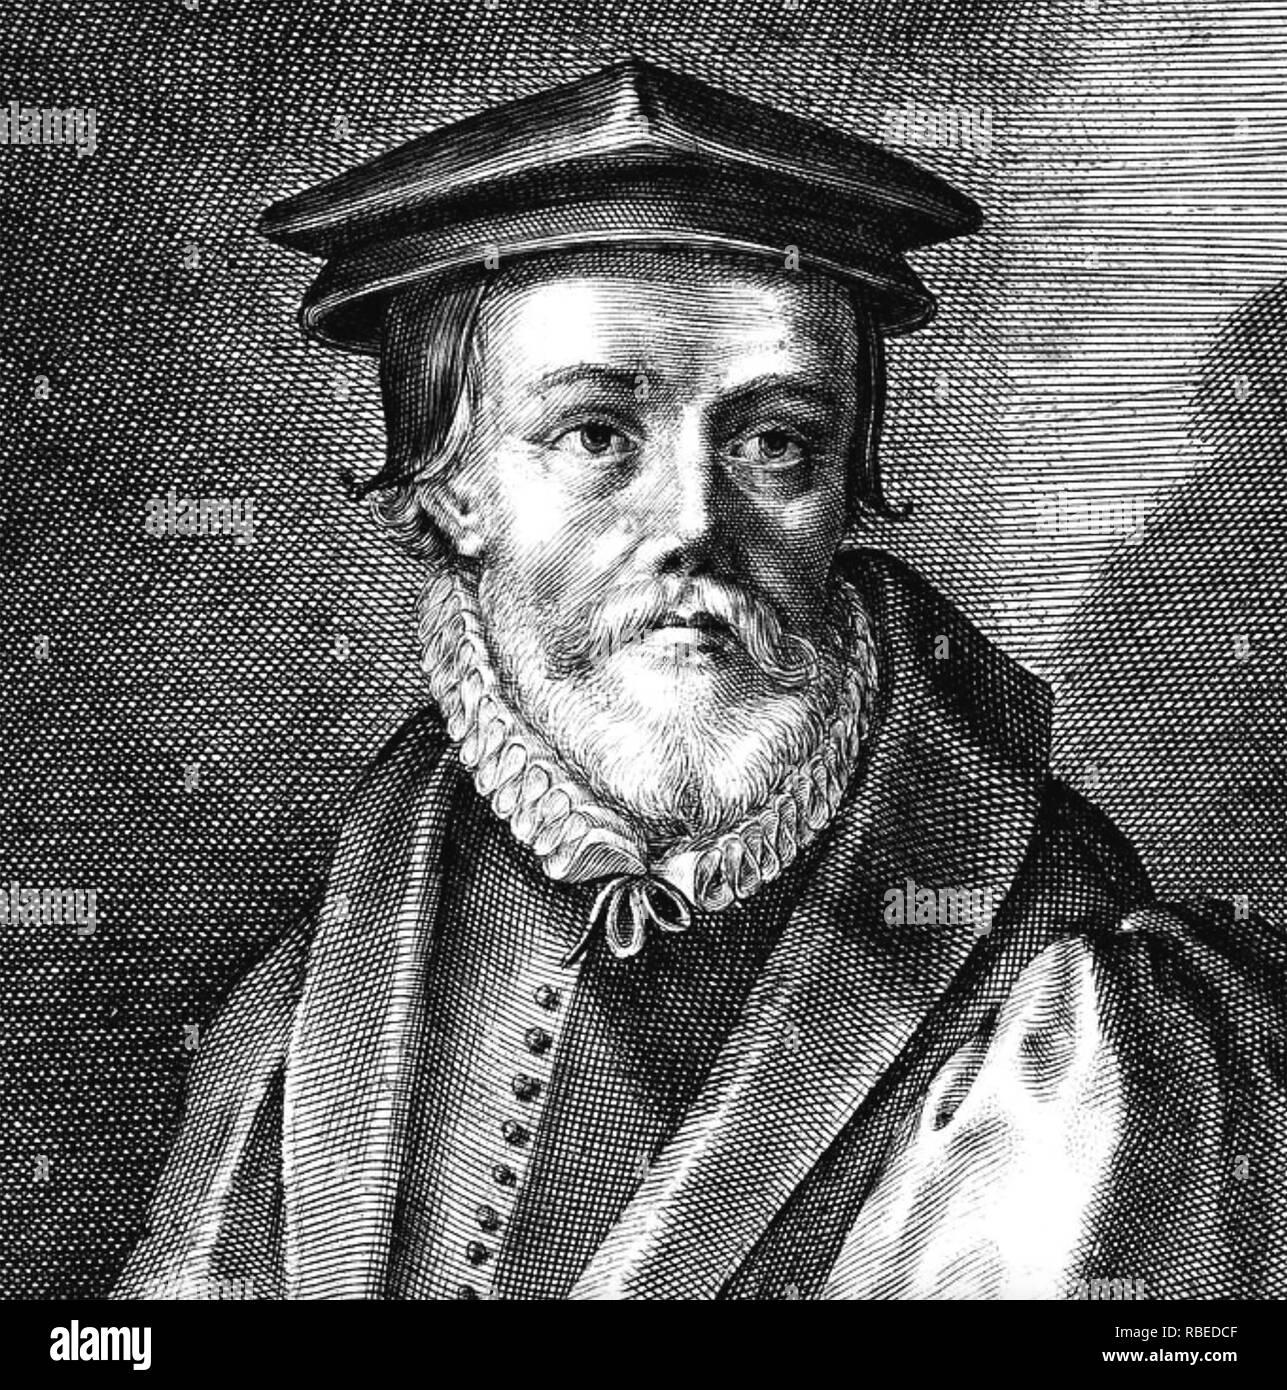 JOHN BRADFORD (1510-1555) Church of England Reformer executed for alleged crimes against Mary Tudor - Stock Image